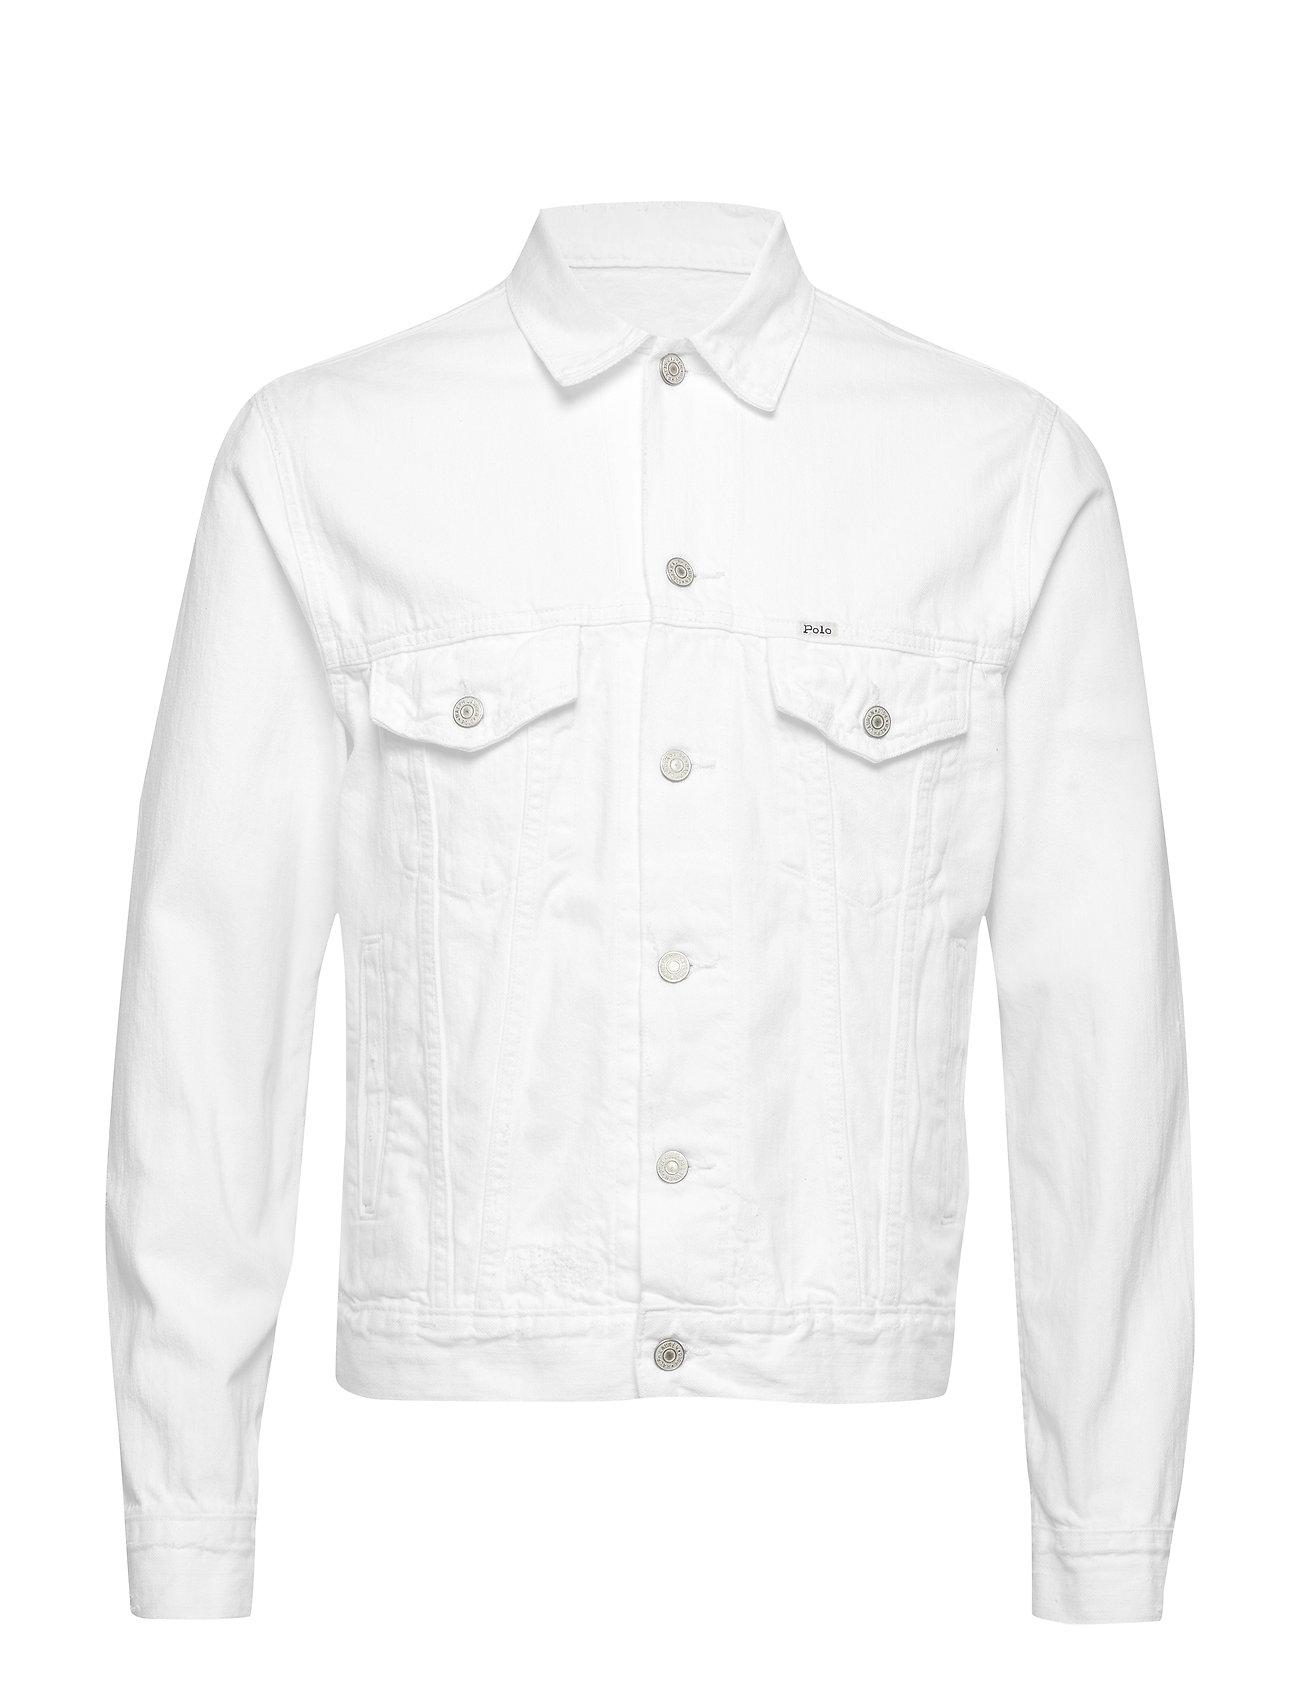 cb0e01f366c Denim Trucker Jacket (Stowe) (229 €) - Polo Ralph Lauren - | Boozt.com